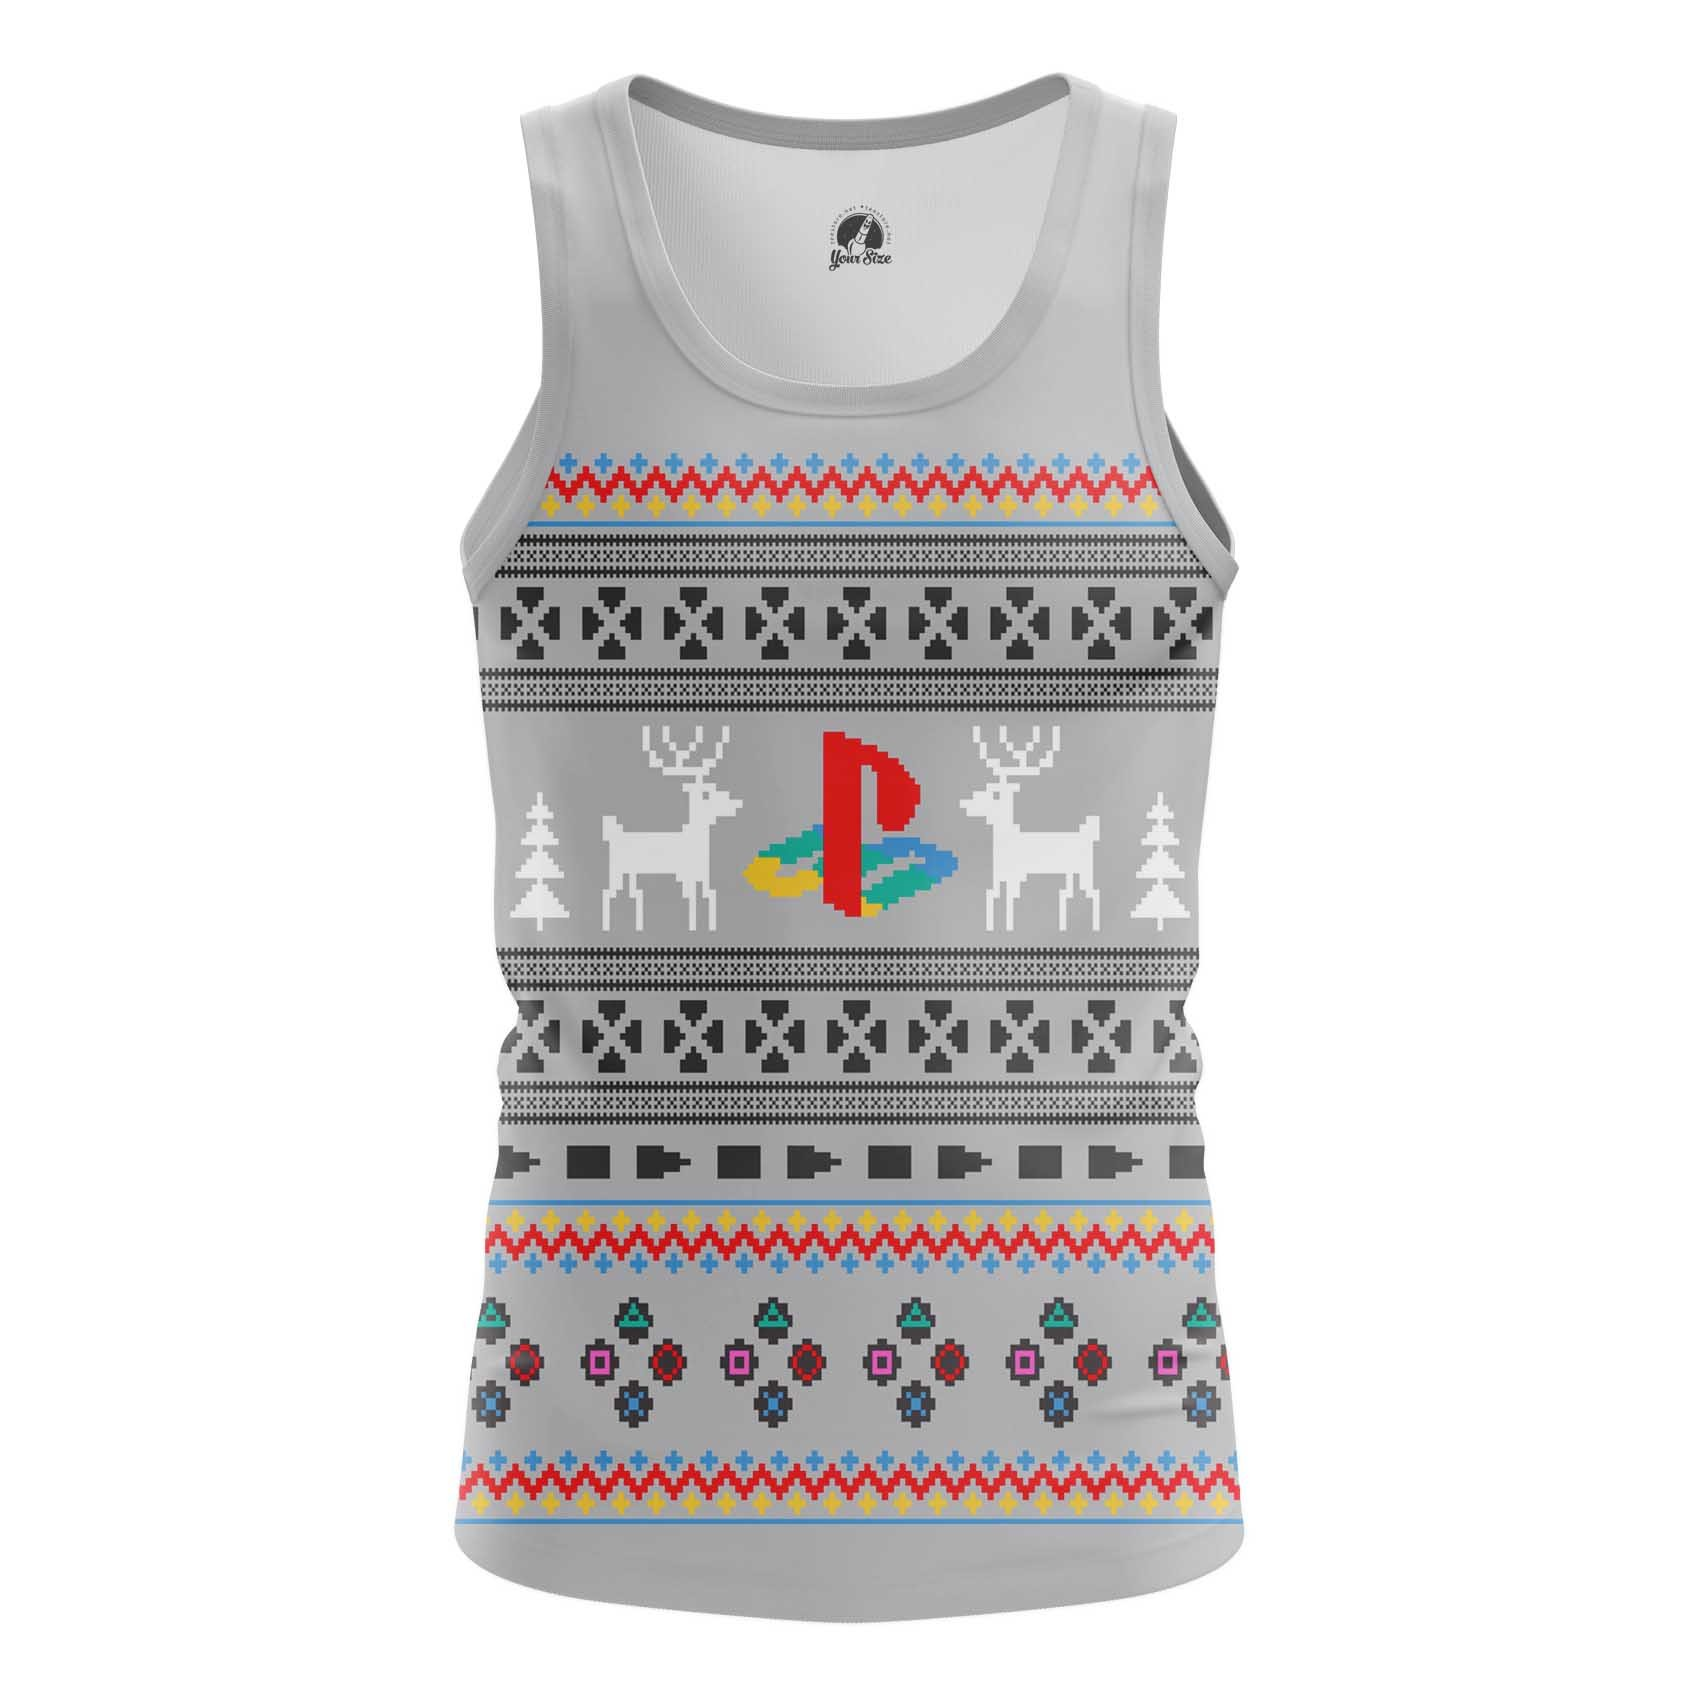 Merch Men'S T-Shirt Playstation X-Mas Christmas Special